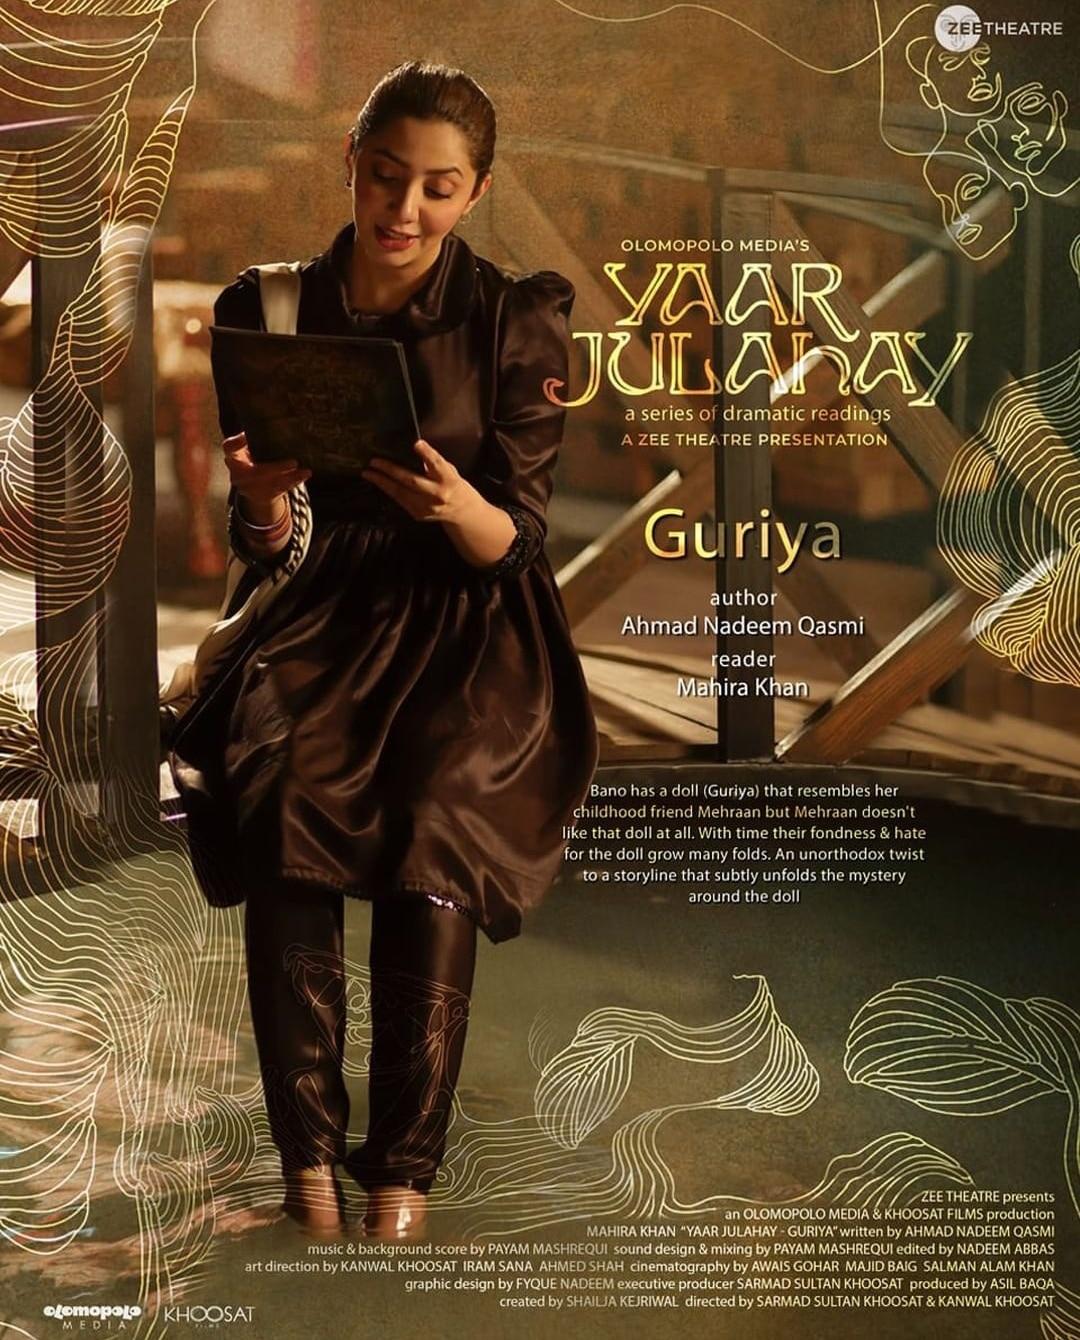 Yaar Julahay by Sarmad Khoosat featuring Mahira Khan